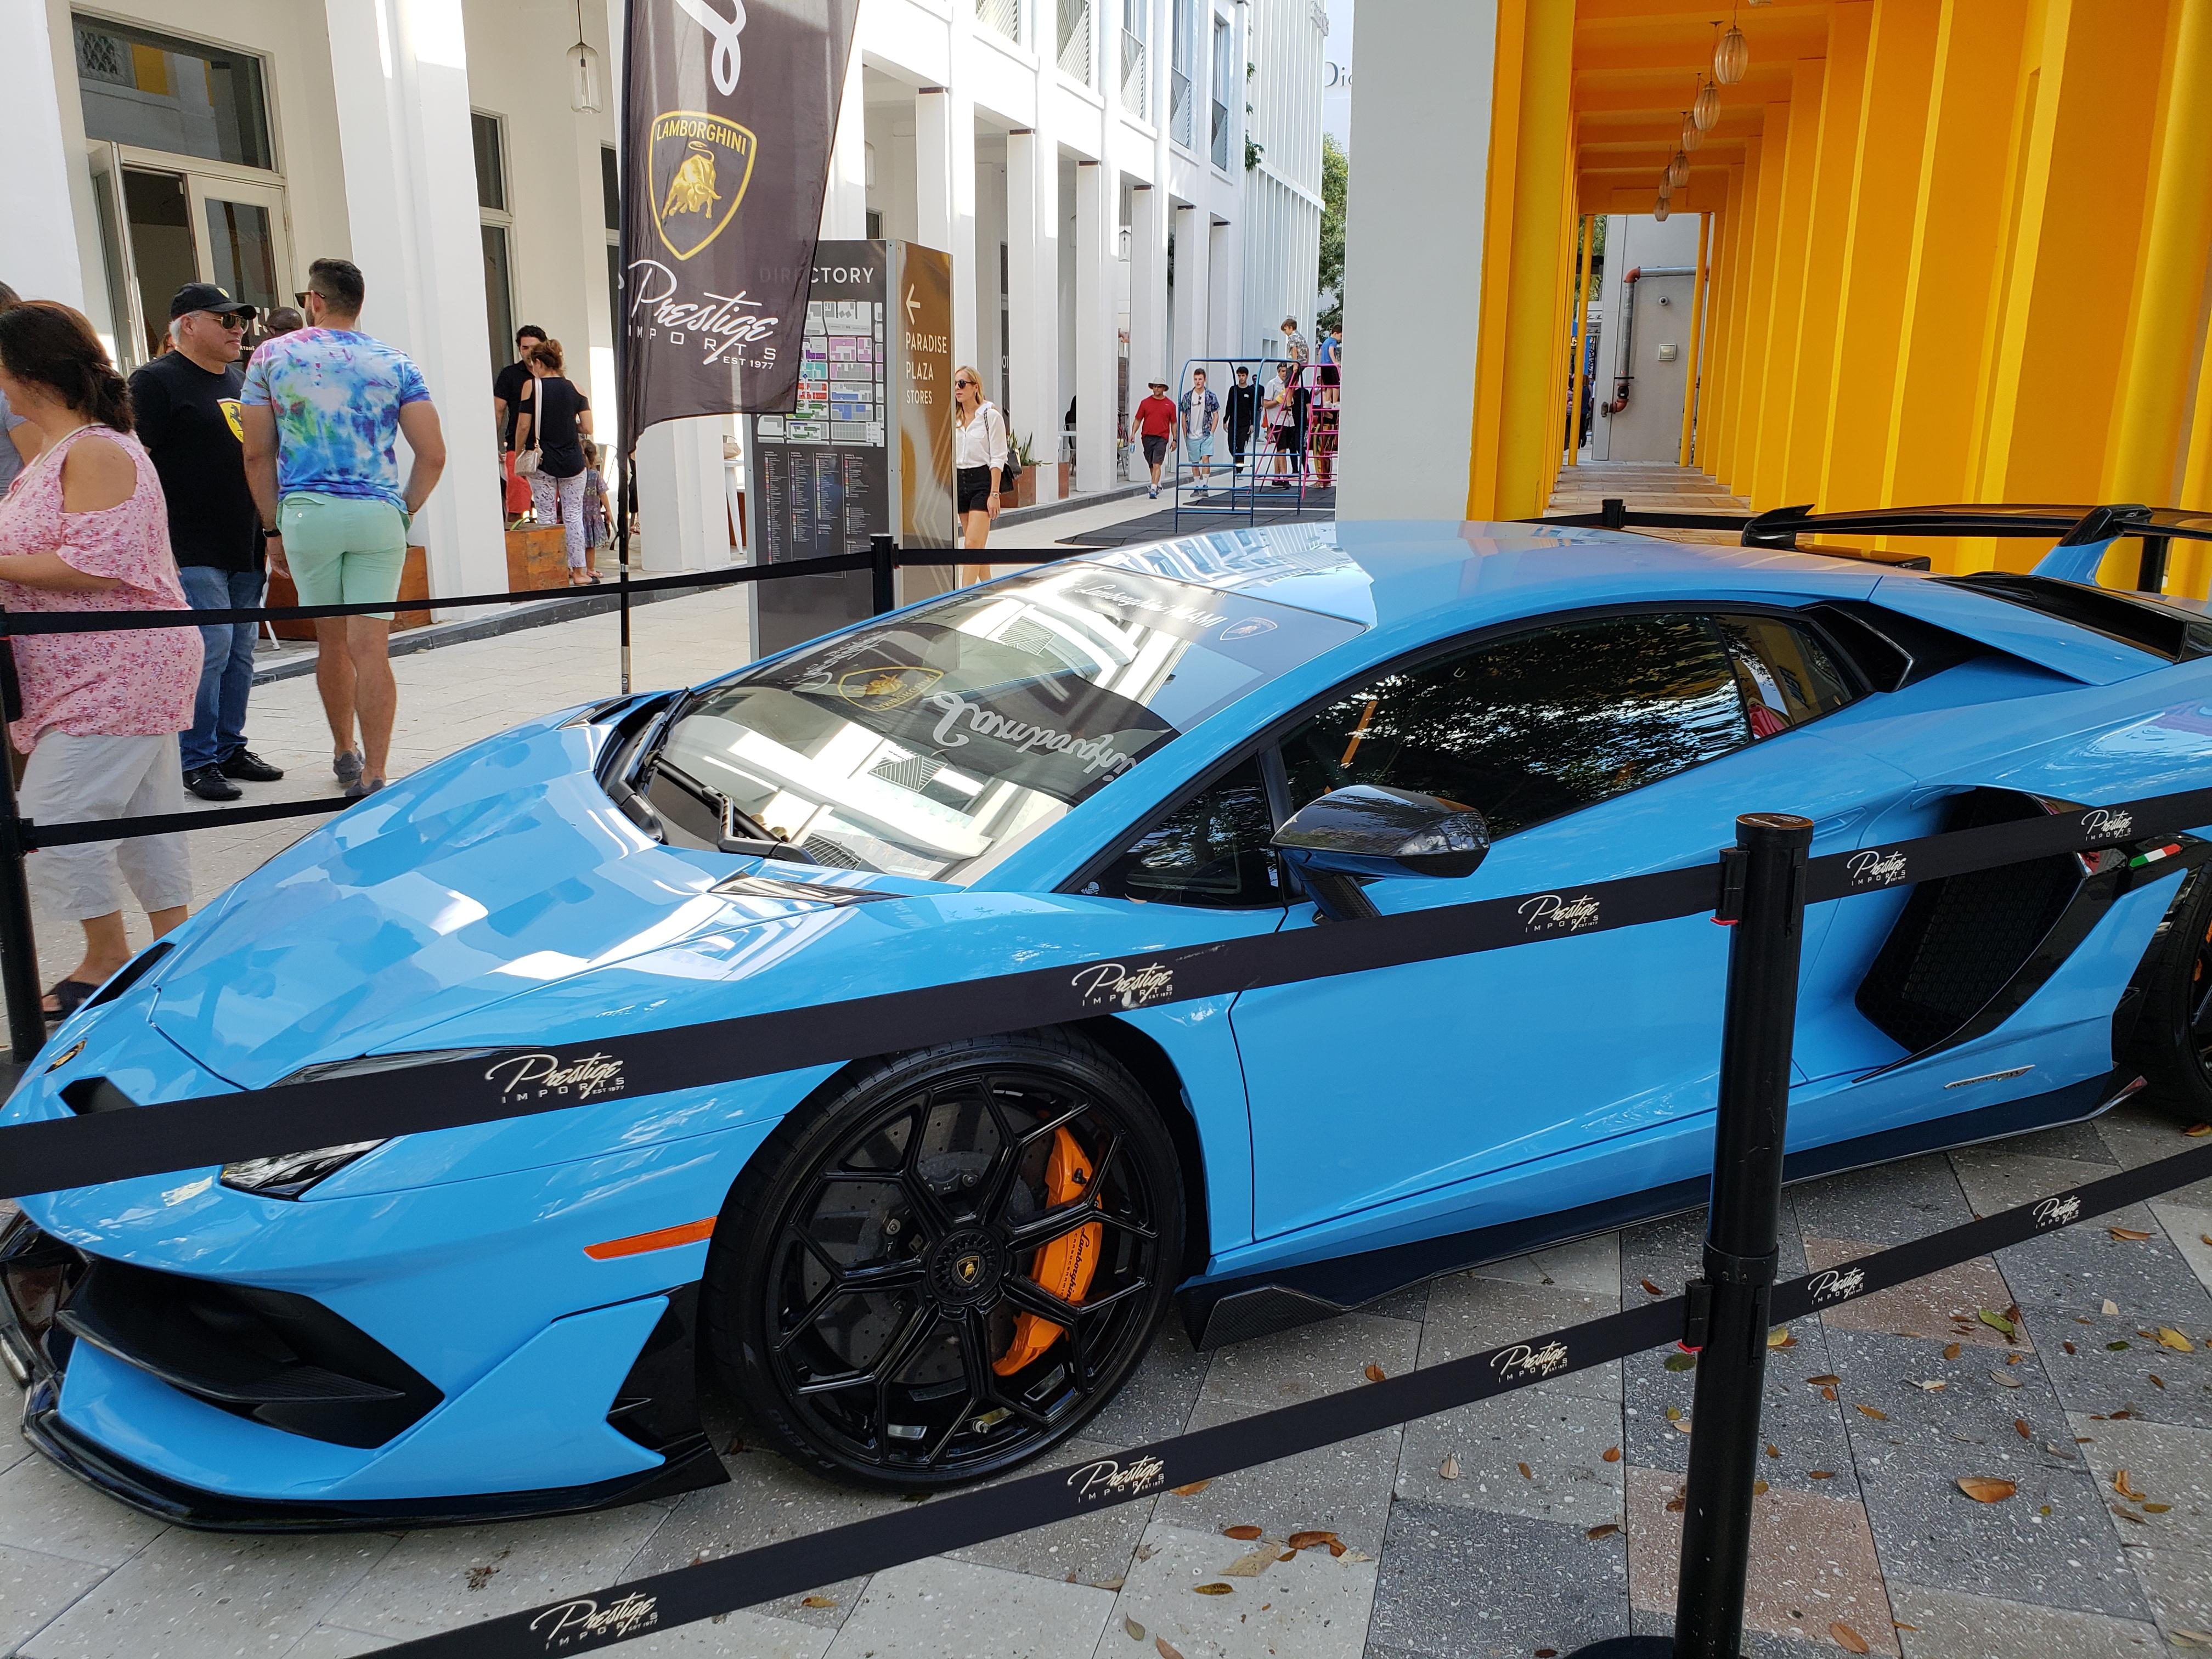 Miami Car Show >> 2019 Miami Design District Car Show Exhibit Miamitext